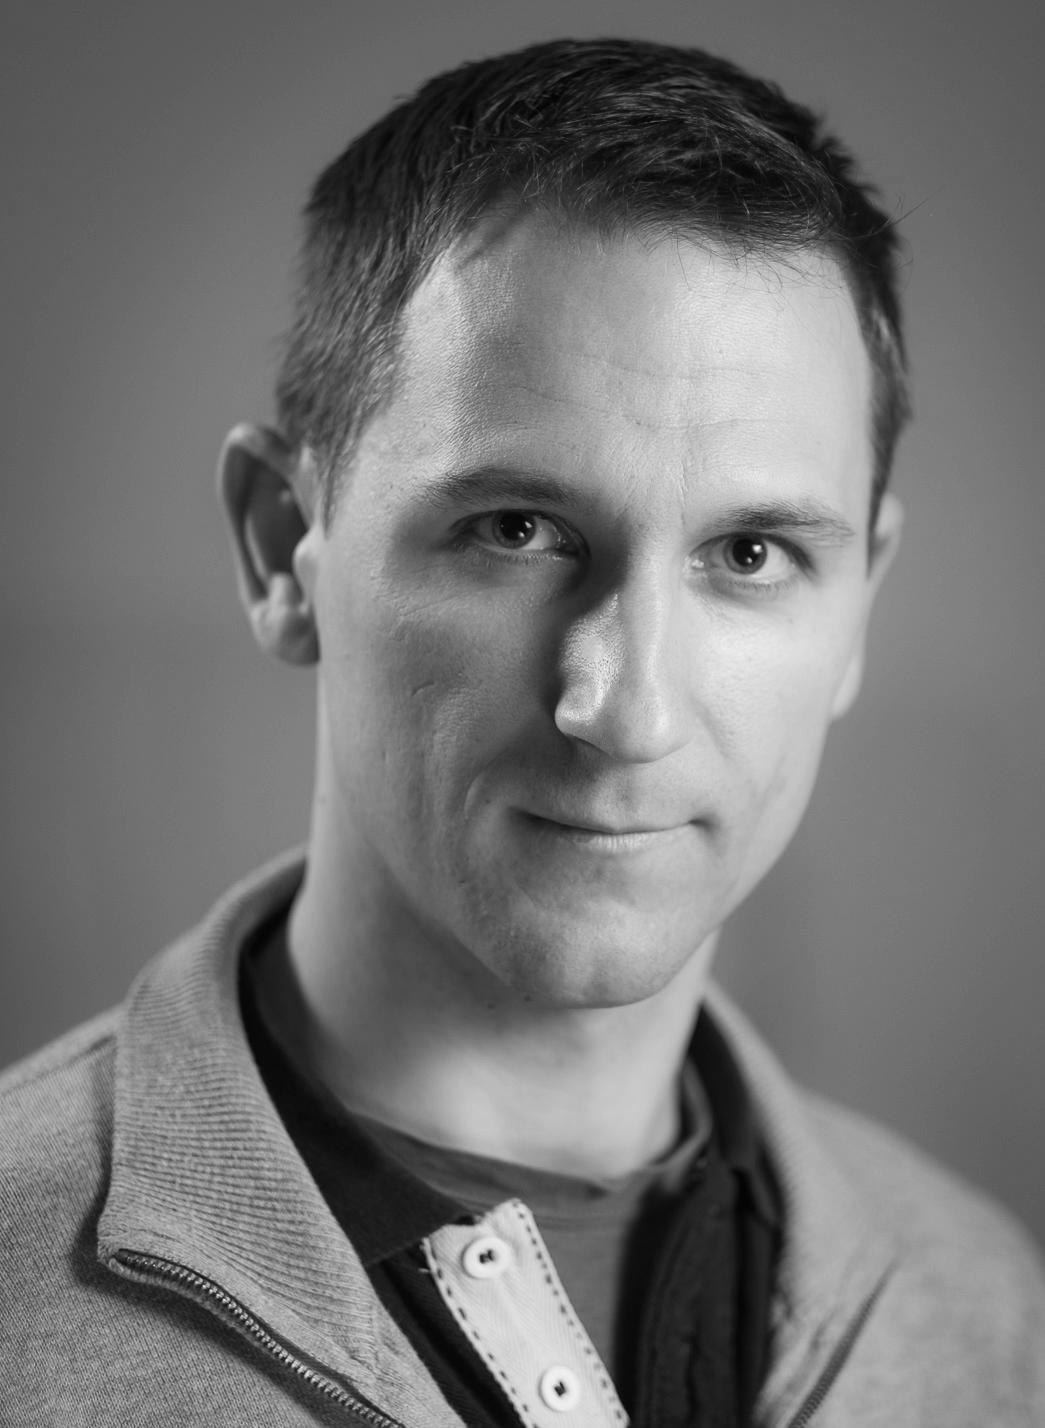 אלכס גורביץ' אלכס גורביץ׳, מנהל קריאייטיב, מעצב המגזין | צילום: ודים ברסטצקי